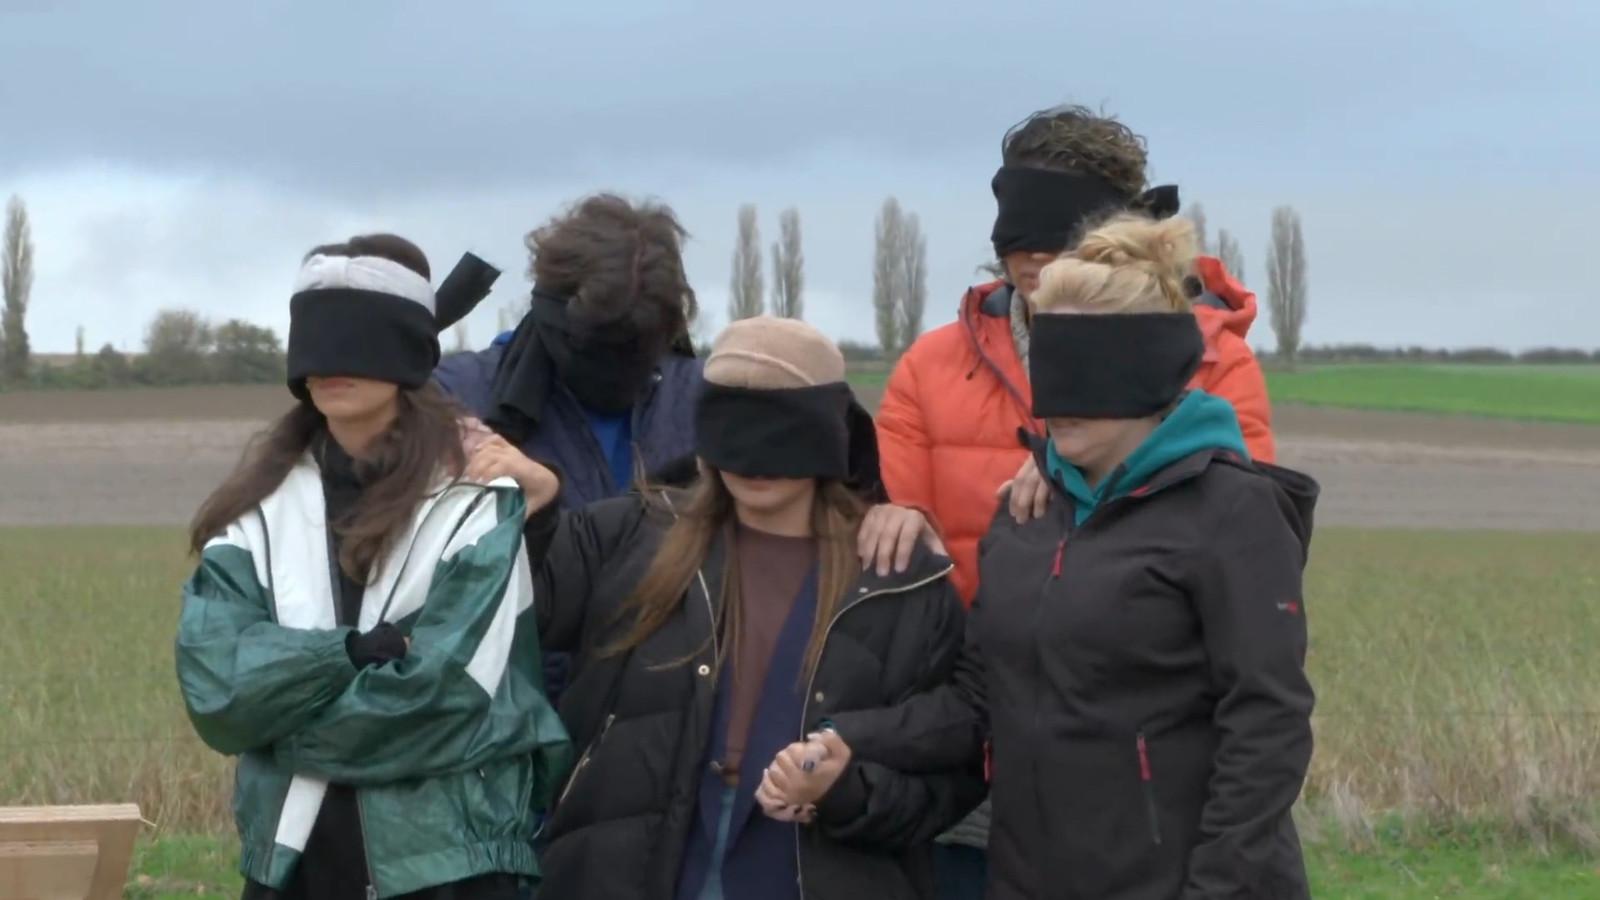 Holly Mae Brood, Steven Kazàn, Abbey Hoes, Chatilla van Grinsven en Samantha van Grinsven wachten angstvallig af welke missie zij moeten uitvoeren op het kerkhof.